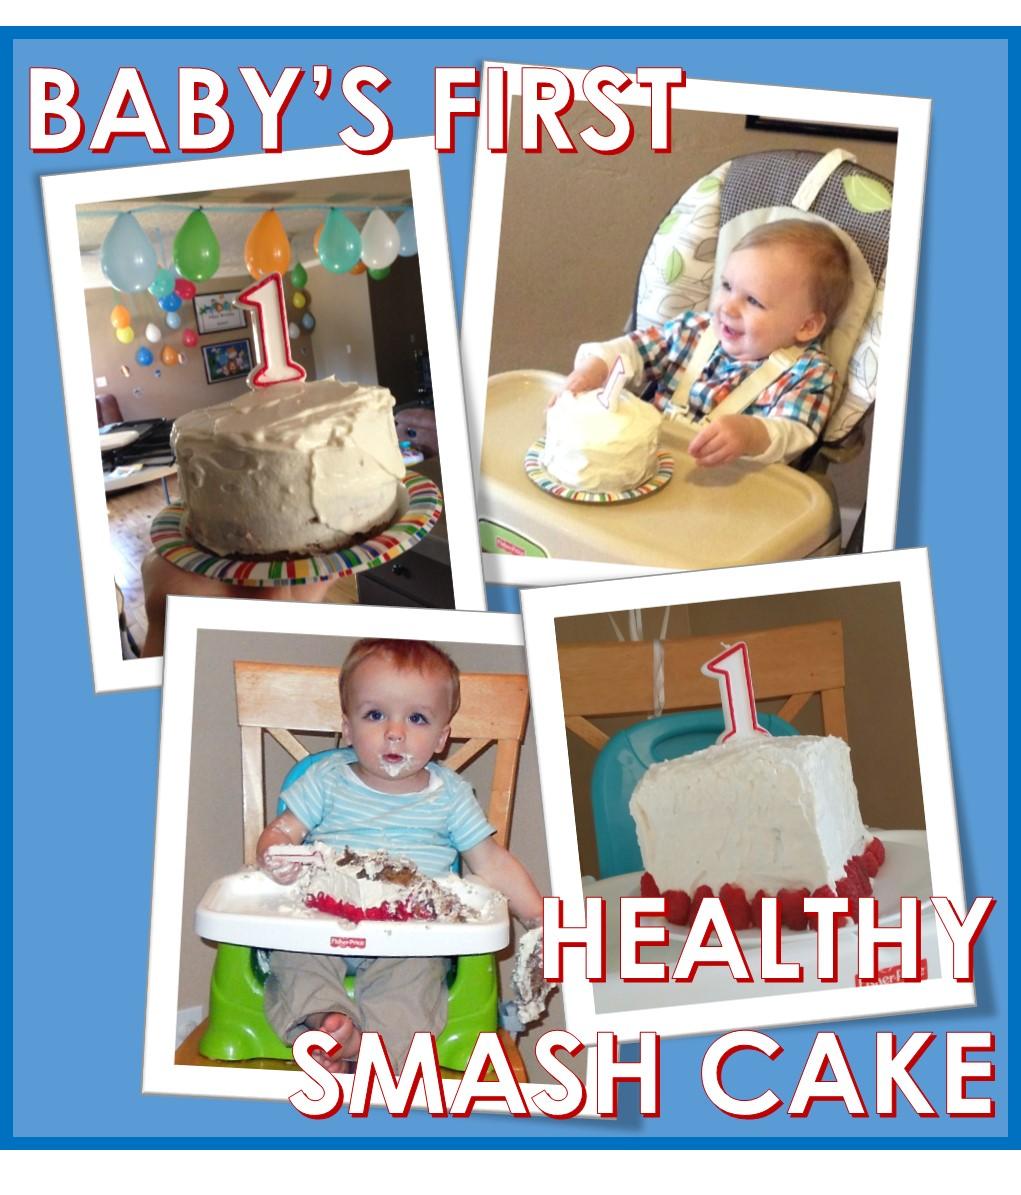 Healthy smash cake Babys First Birthday Cake because life